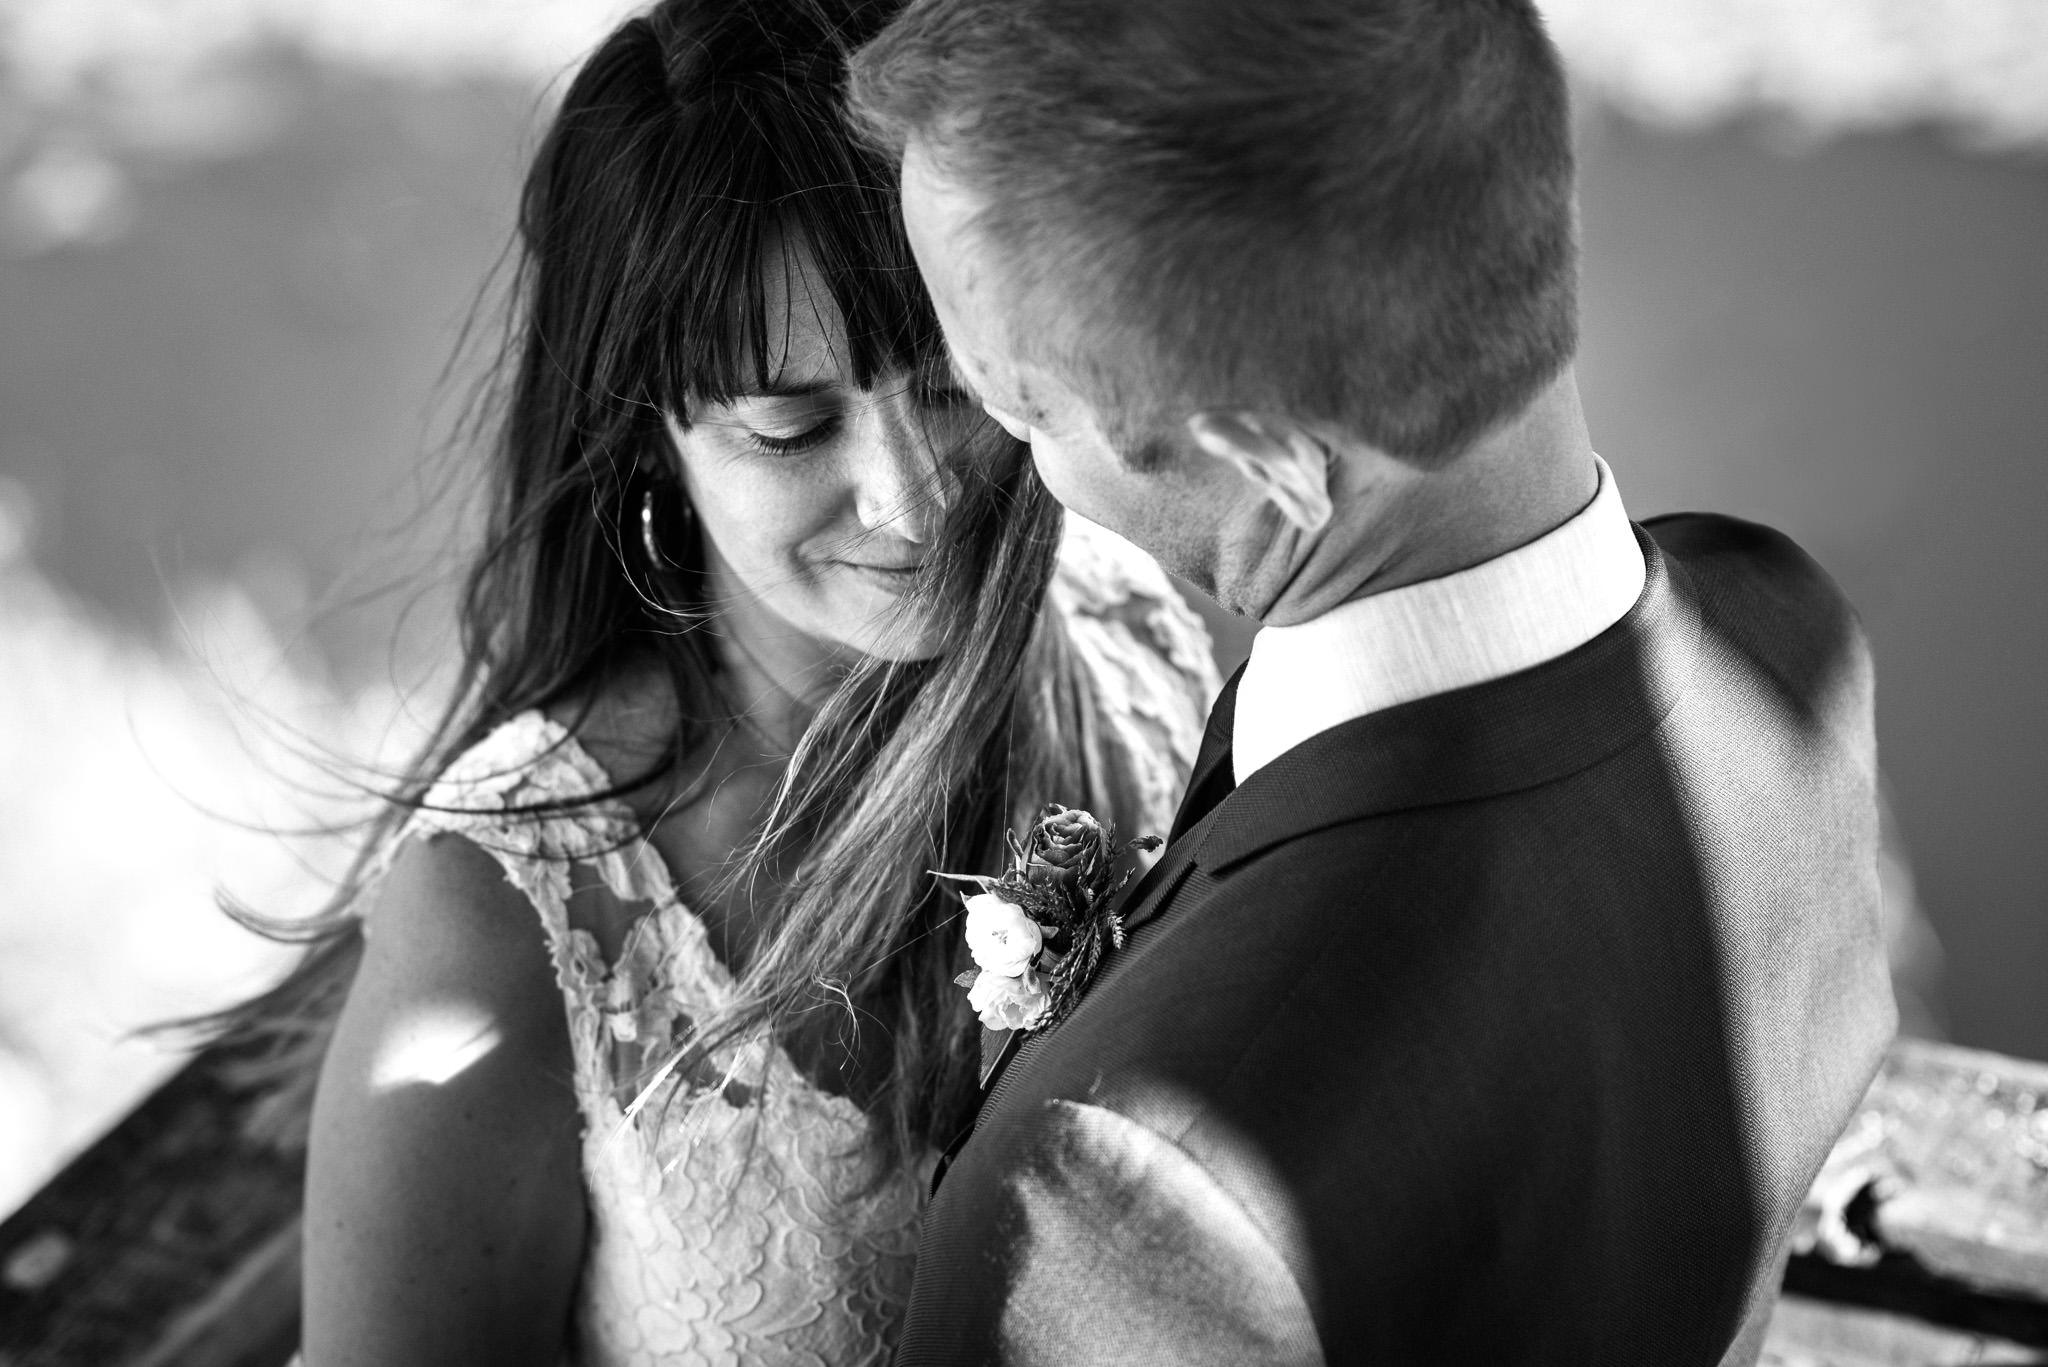 Melanie-Matt-Pitt-Lake-Post-Wedding-Shoot-Victoria-Wedding-Photographers-10.jpg